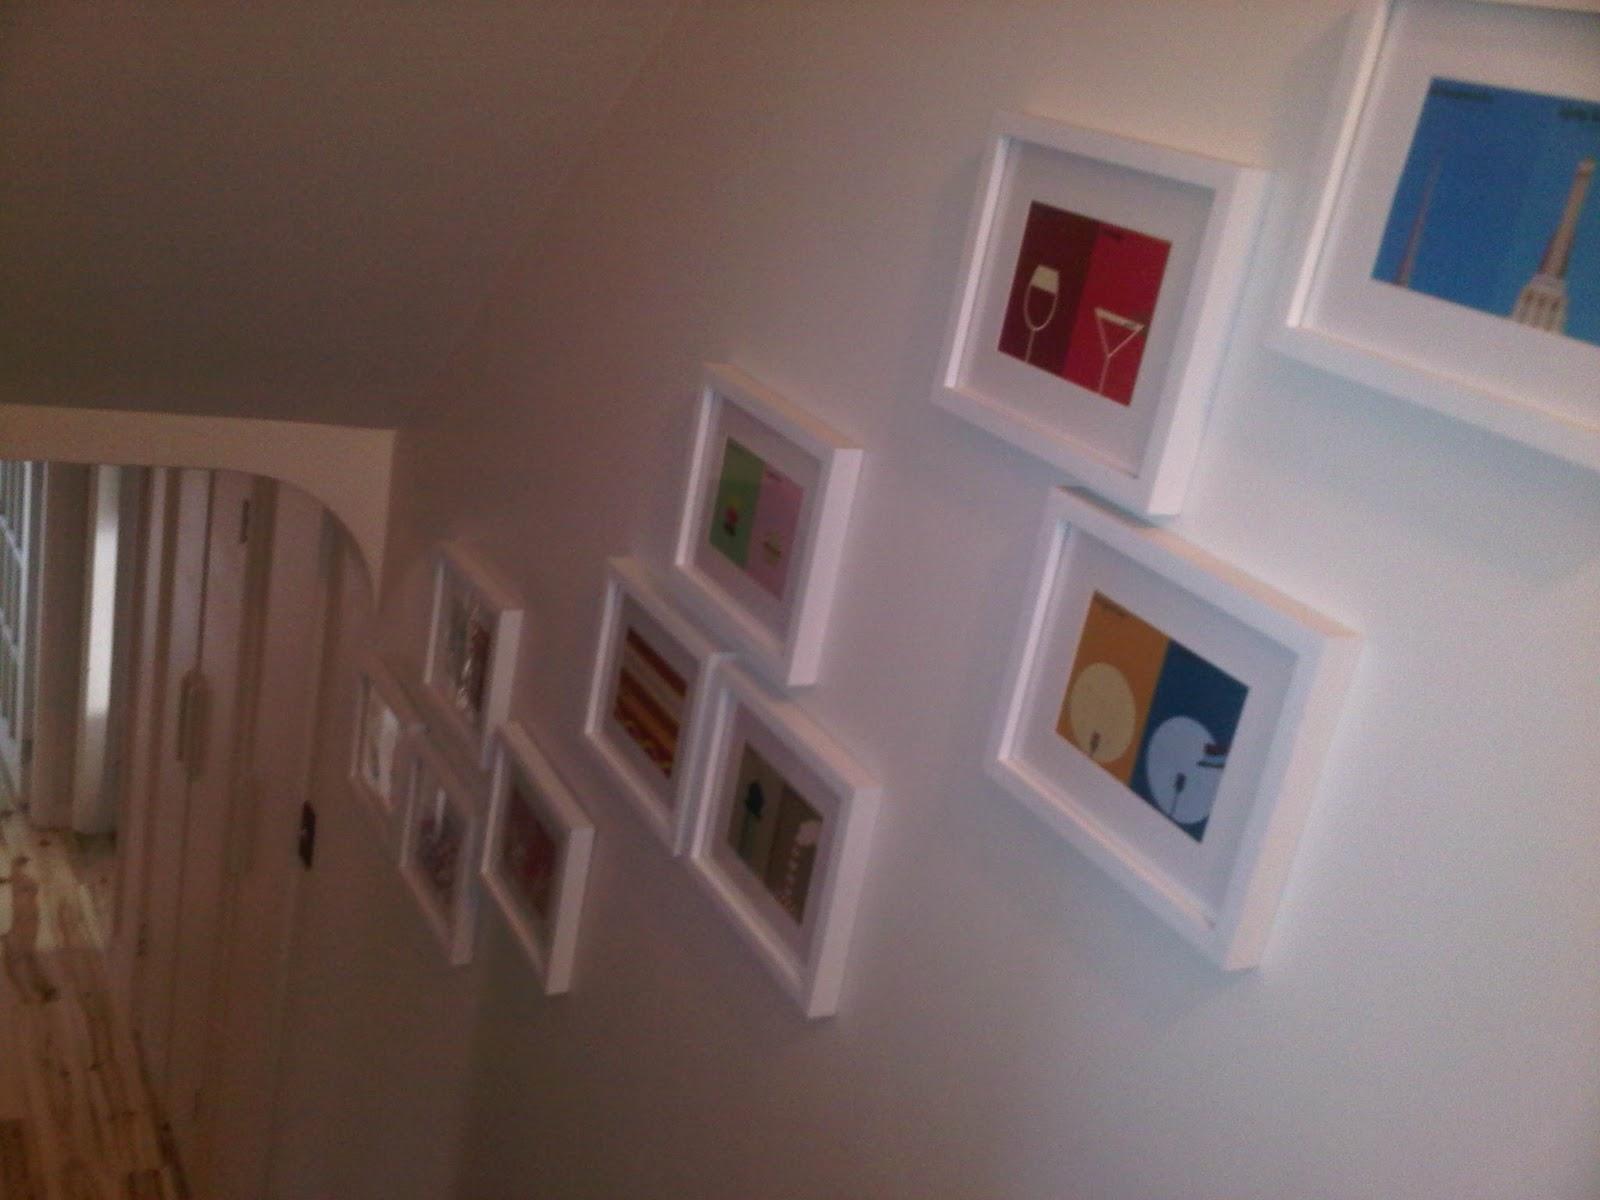 http://1.bp.blogspot.com/-YEcDdyuYJaQ/Tycfx0I5upI/AAAAAAAACg4/VJfRcf6cLwM/s1600/paris+vs+nyc+on+my+walls.jpg